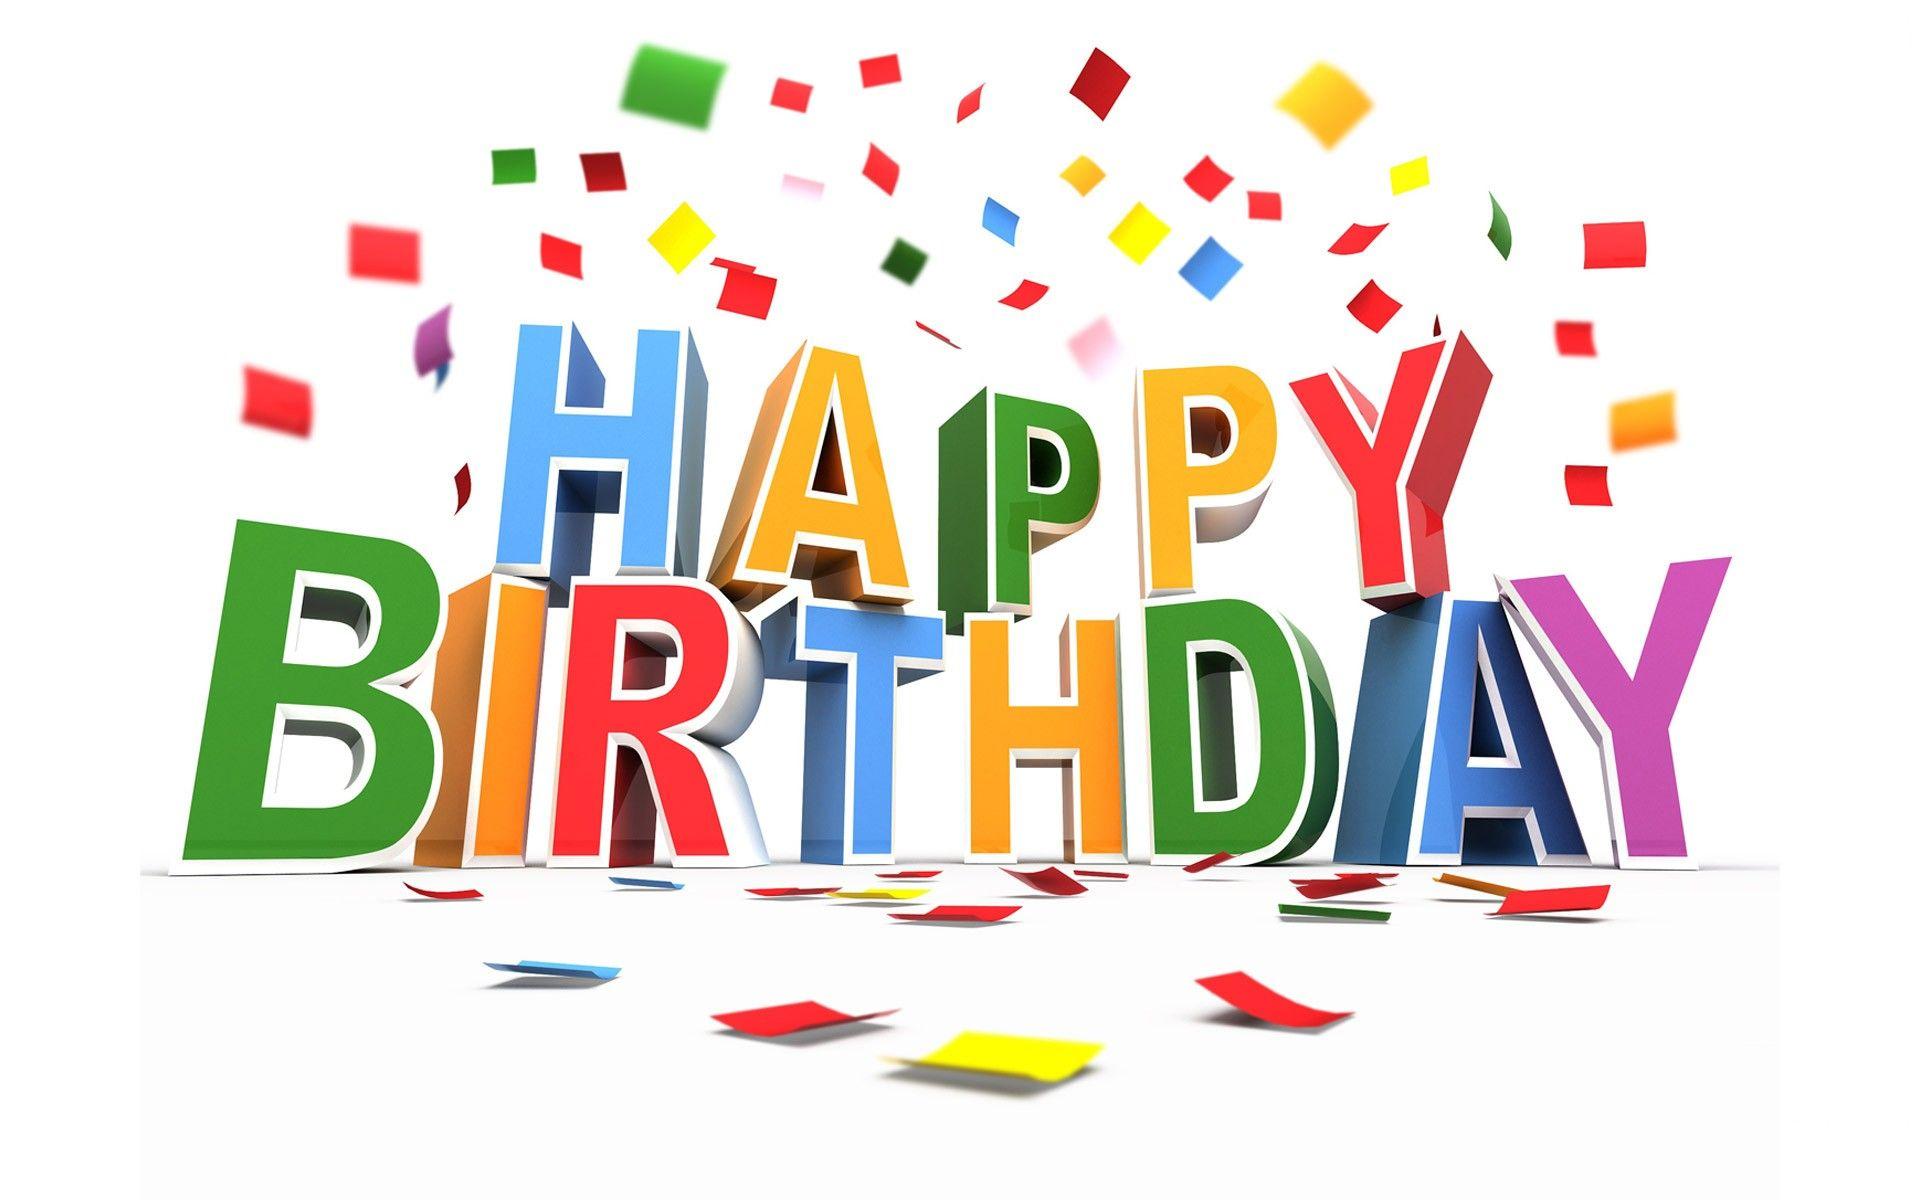 Birthday Wishes 3d Wallpaper Jpg 1920 1200